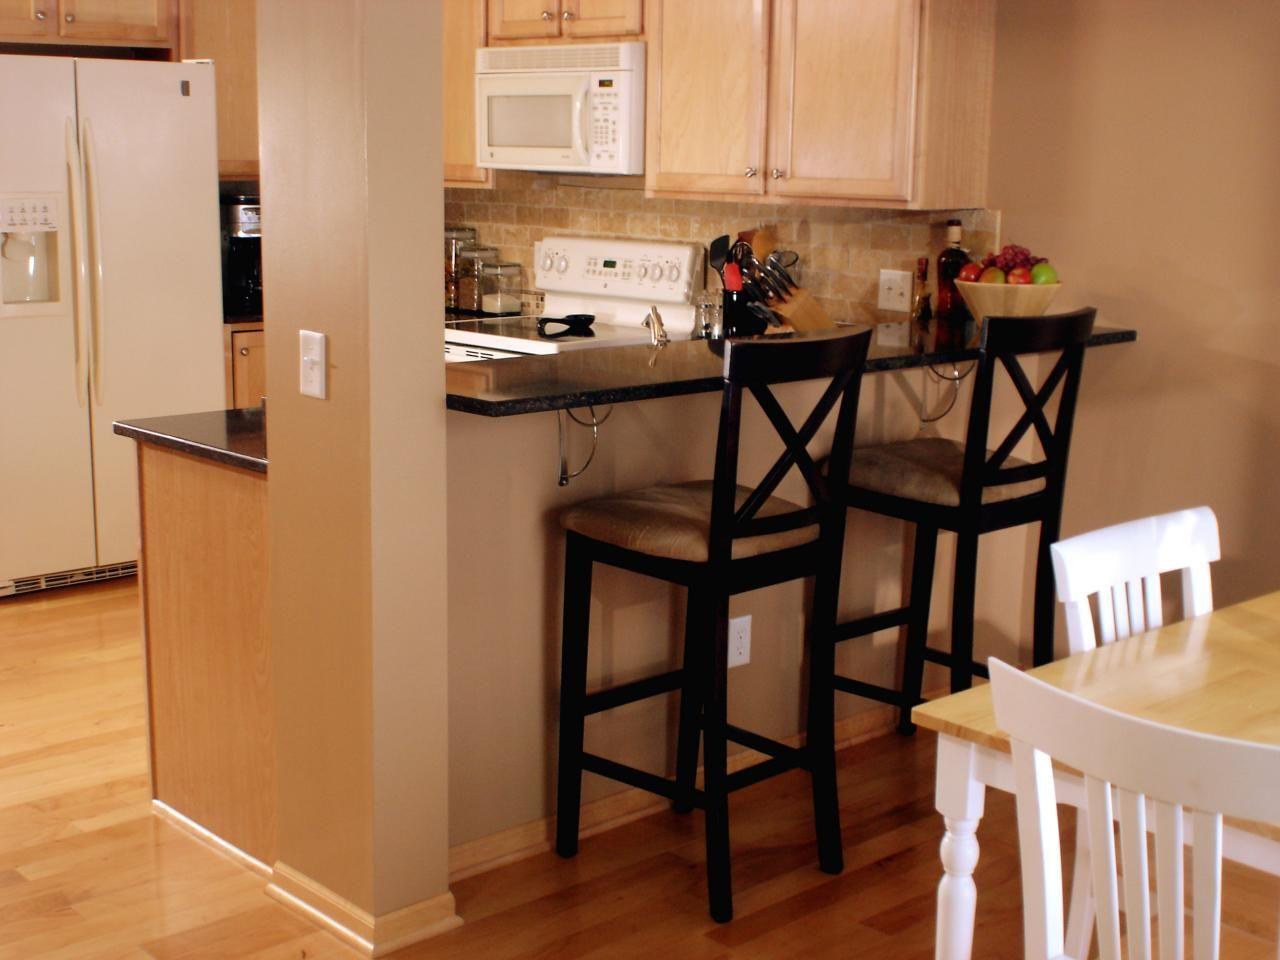 Breakfast Bar Wall Ideas Google Search Kitchen Bar Design Kitchen Design Small Kitchen Bar